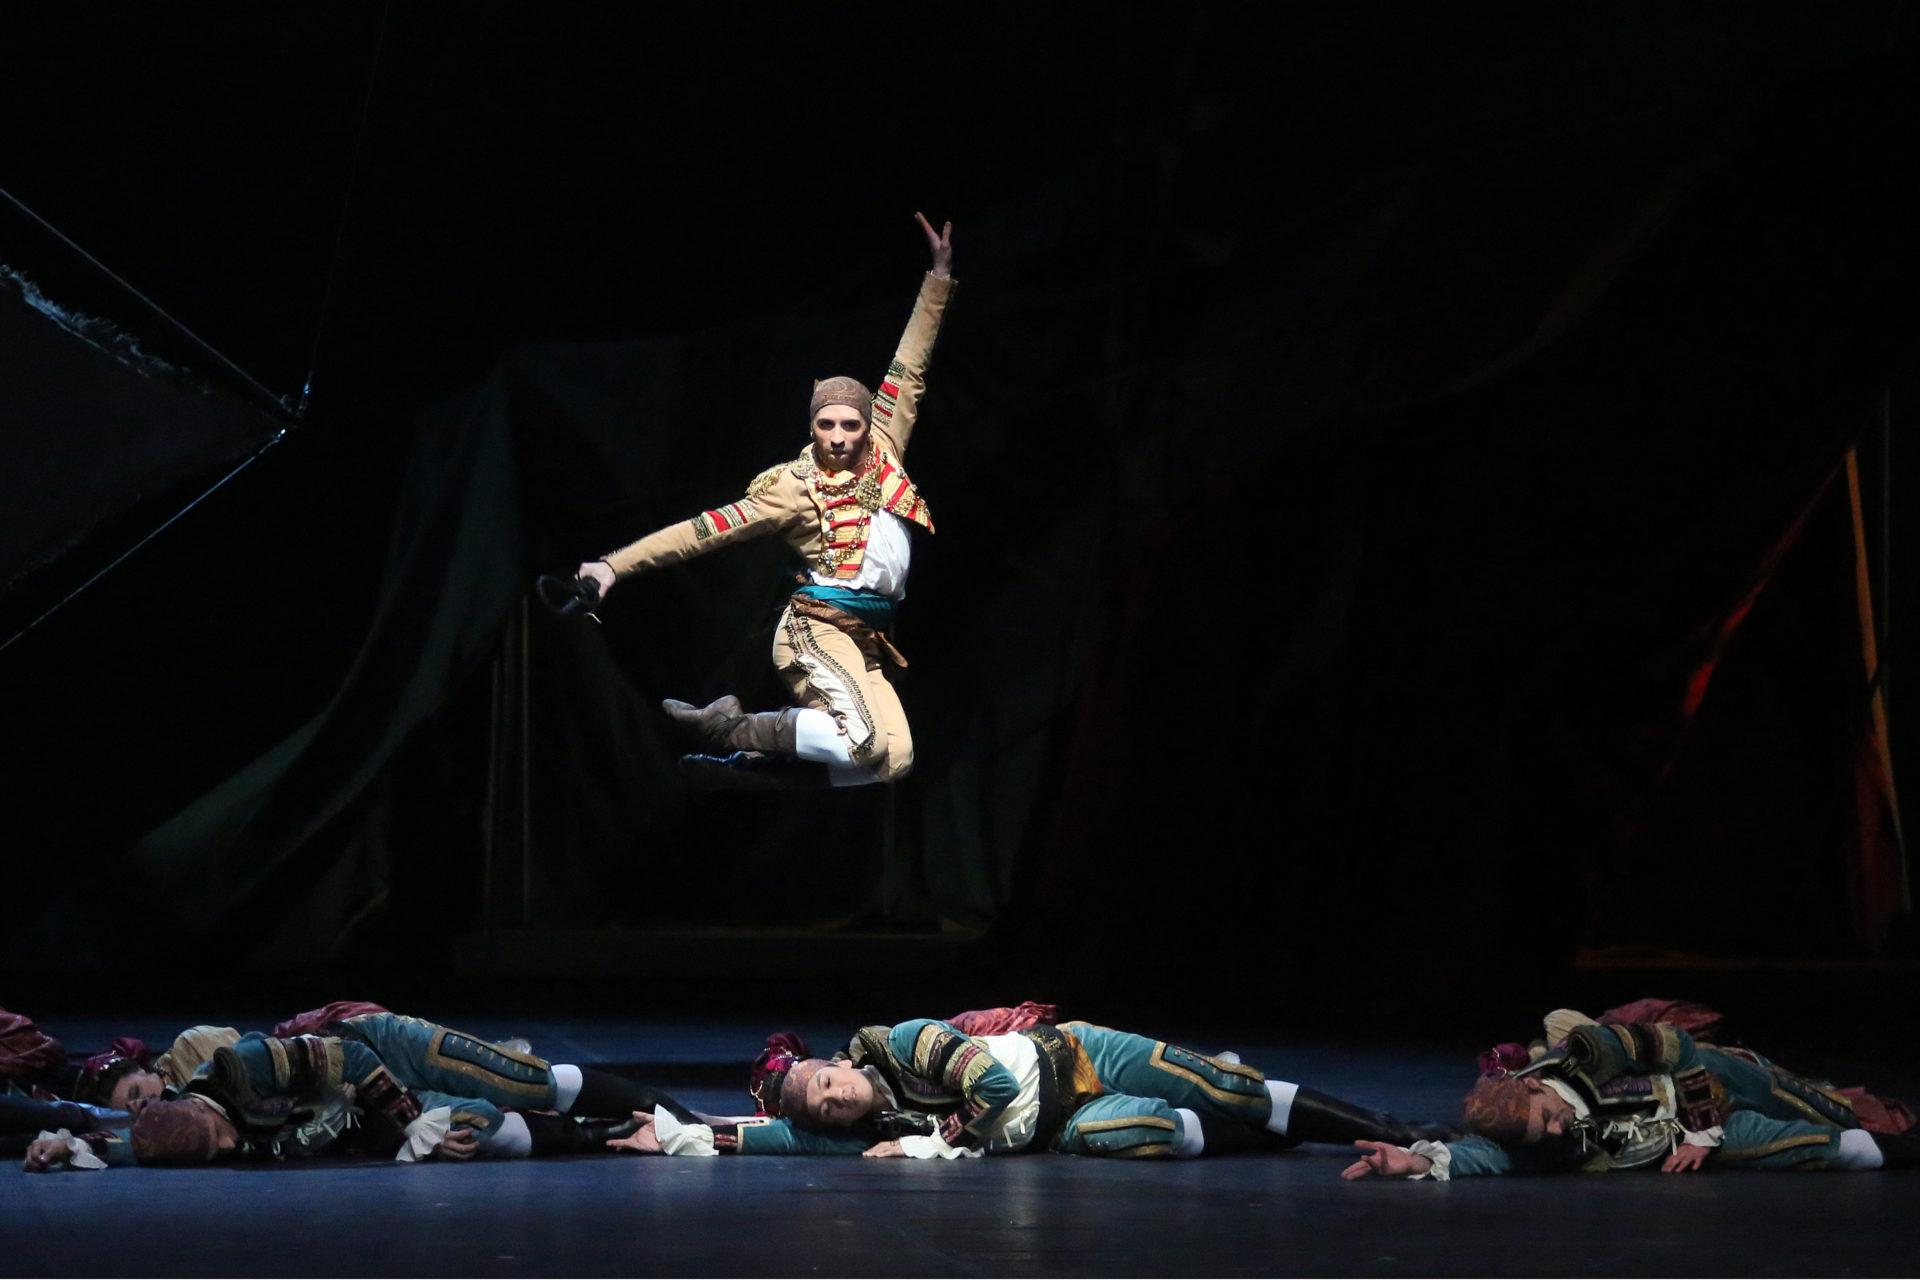 Don_Quixote_HH_Ballett_Foto_AnjaBeutler.de_337